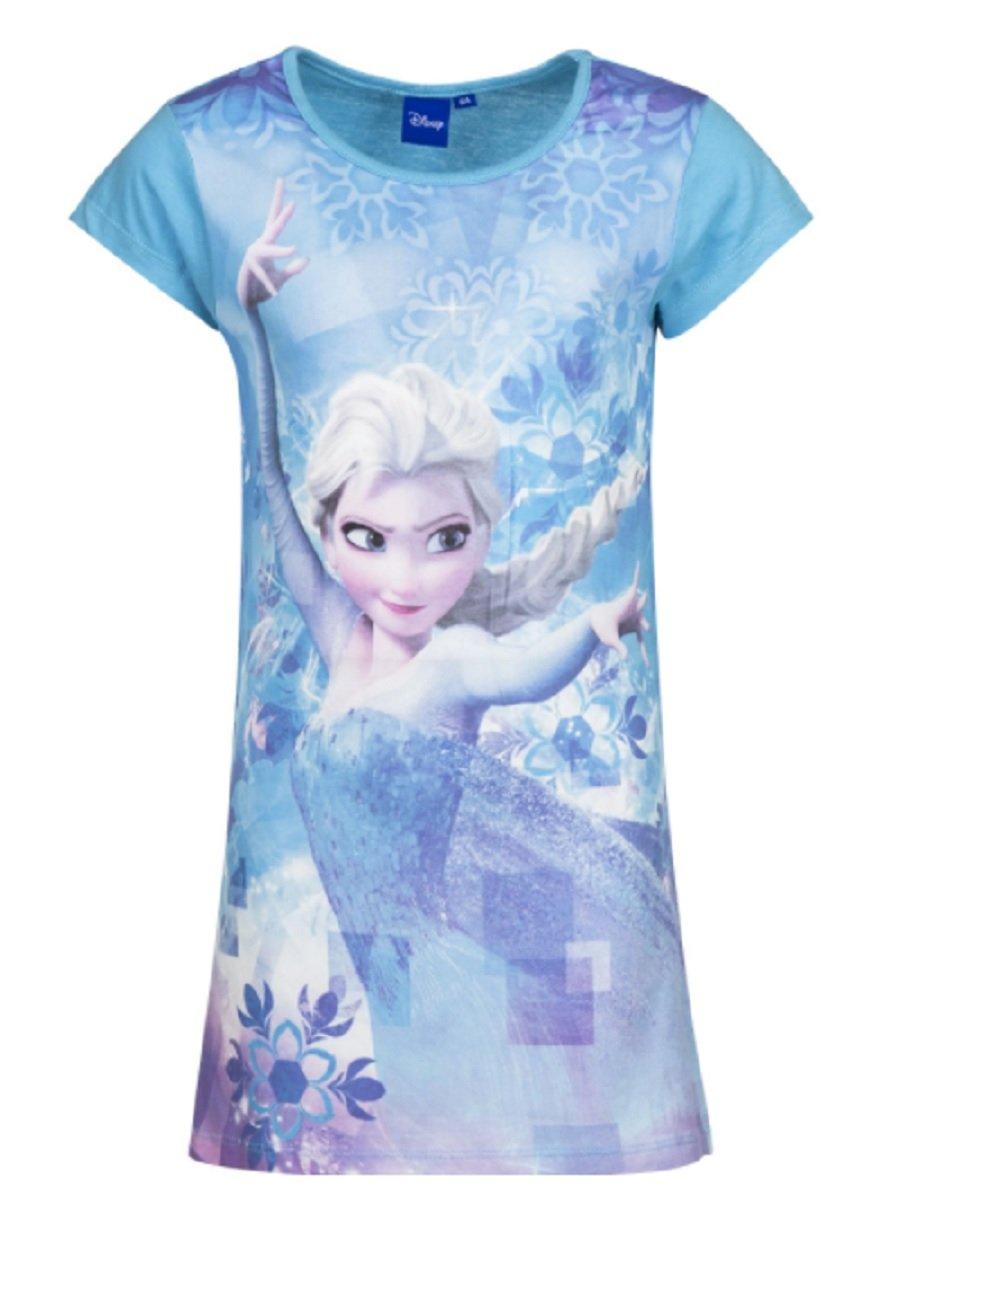 GladRags® Girls Nightie Age 3 4 5 6 7 8 Years Character Official Frozen Elsa Anna Nightwear Gift Night Dress